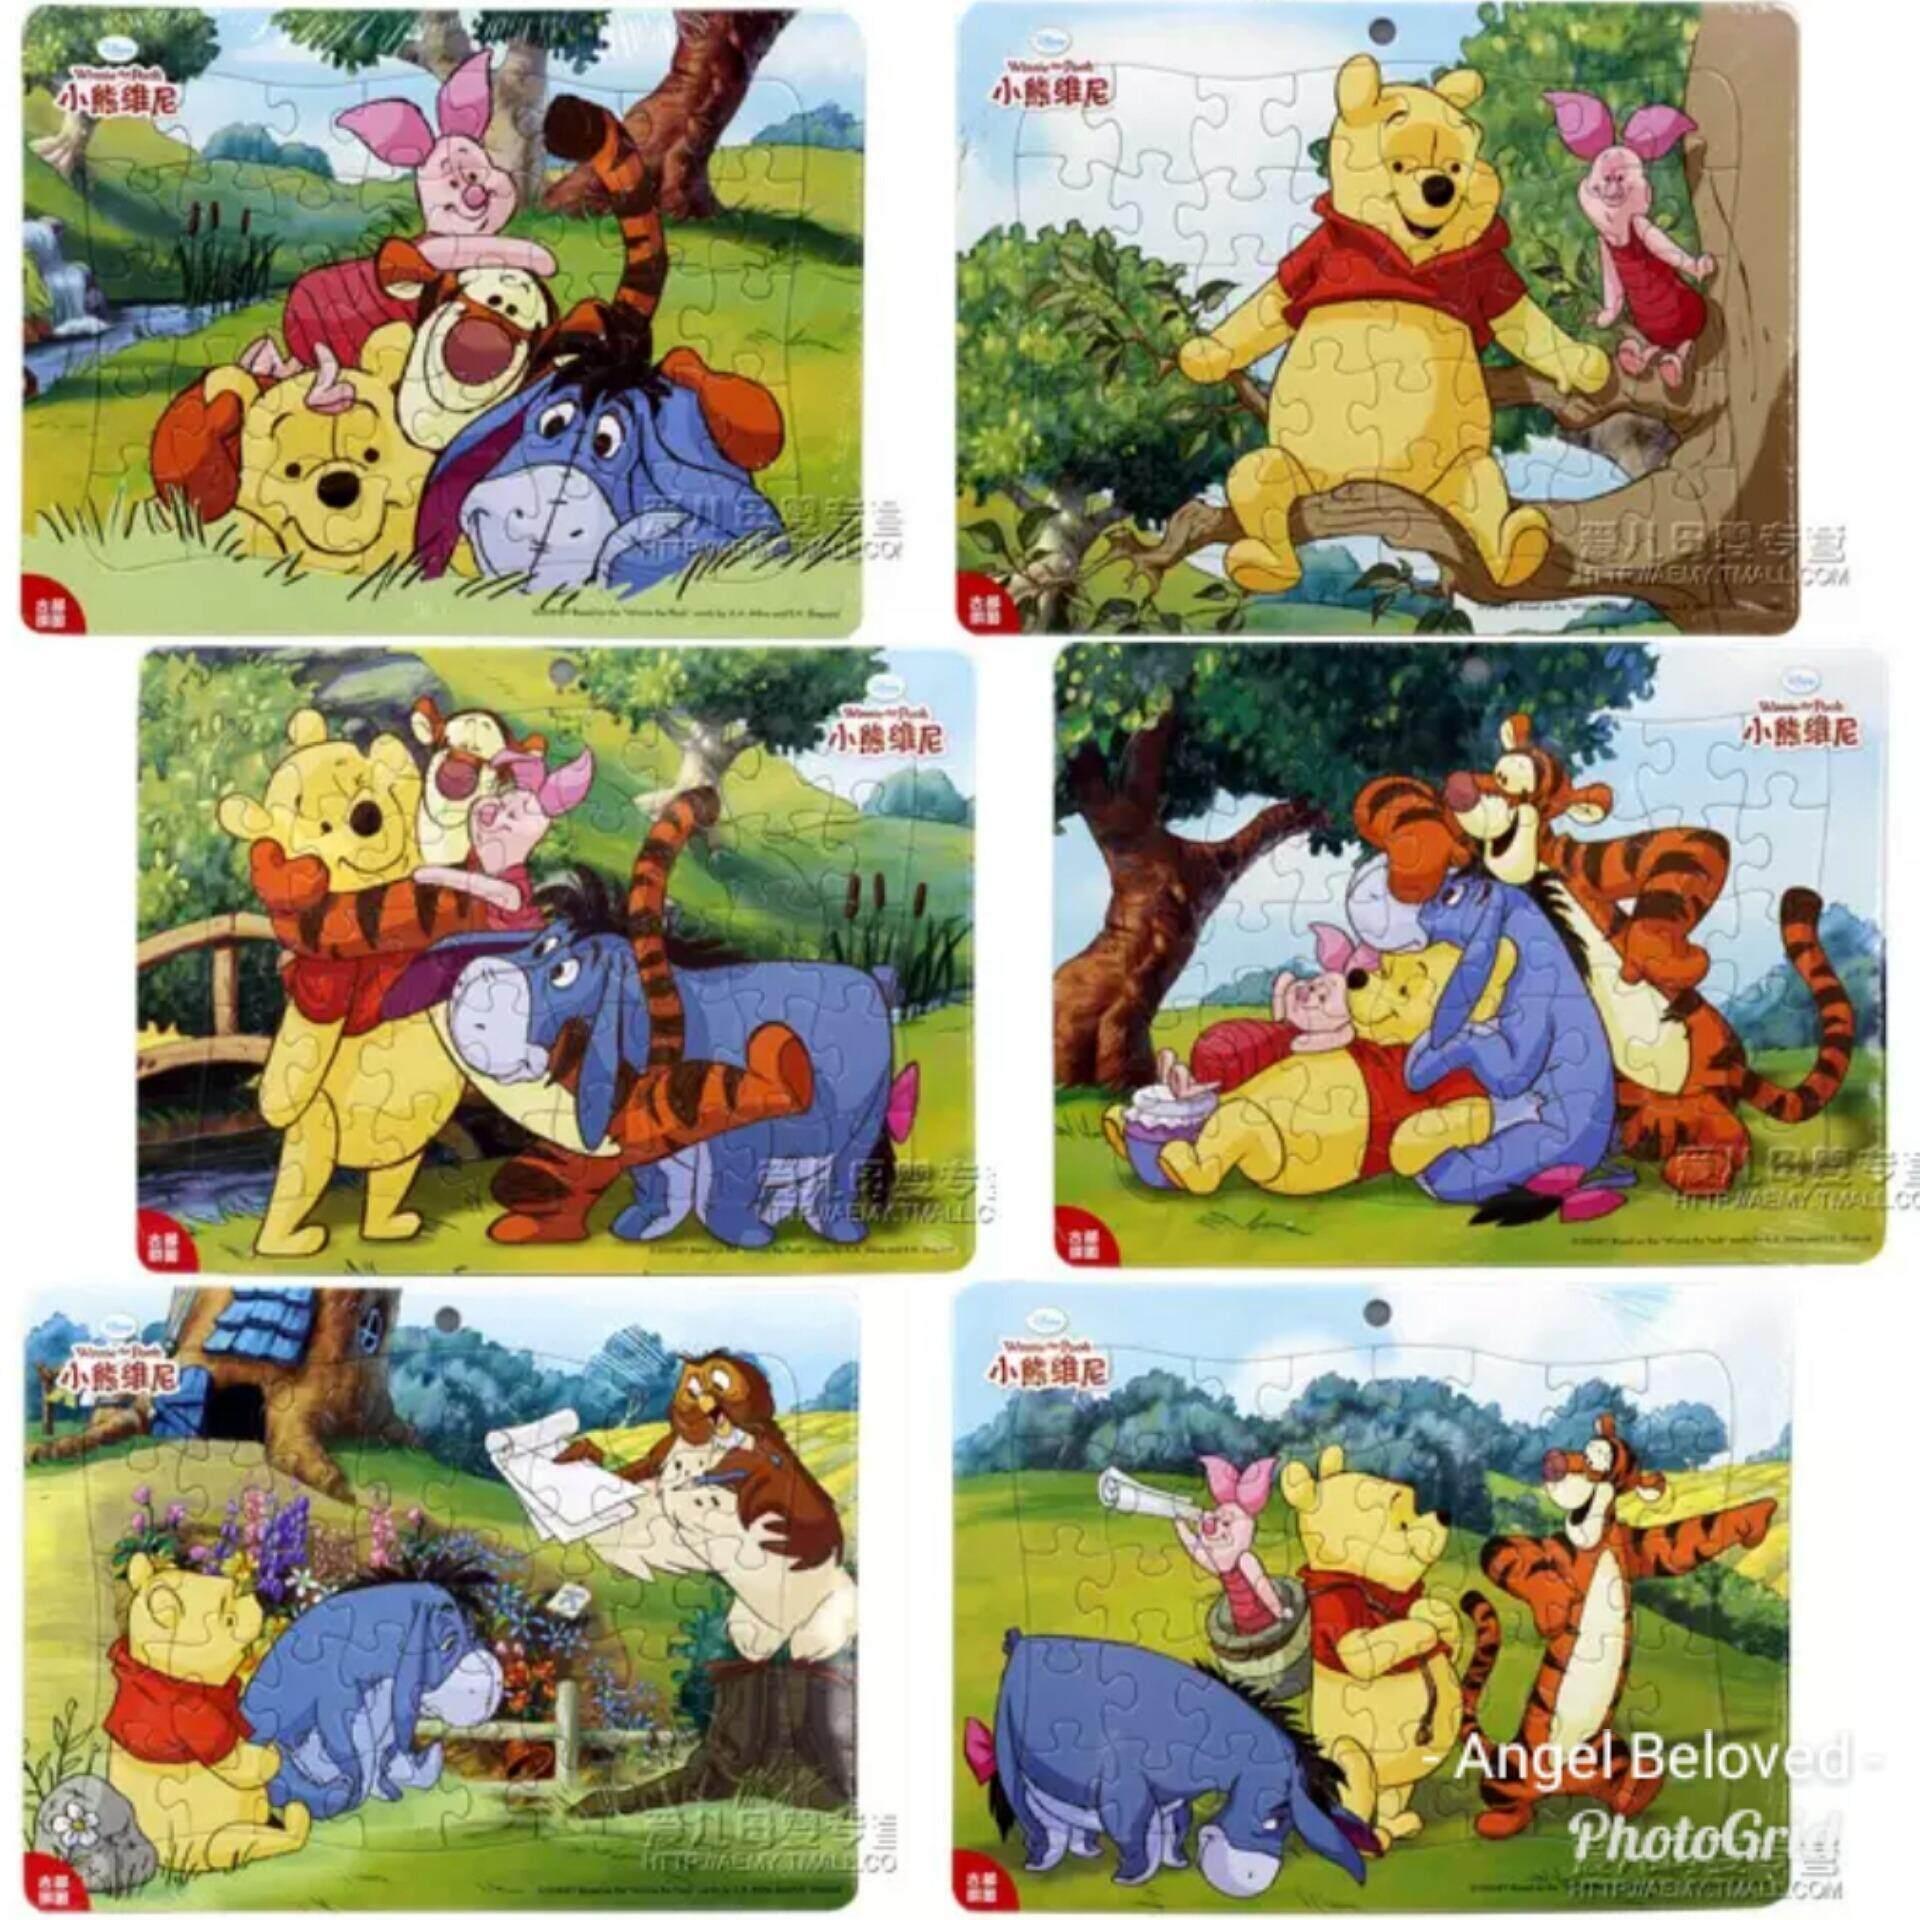 Selimut Vito Kids Sutra Panel 100x140 Cars Daftar Harga Terkini Keroppi Rosanna Source 6 Pcs Jigsaw Puzzle For Winnie The Pooh